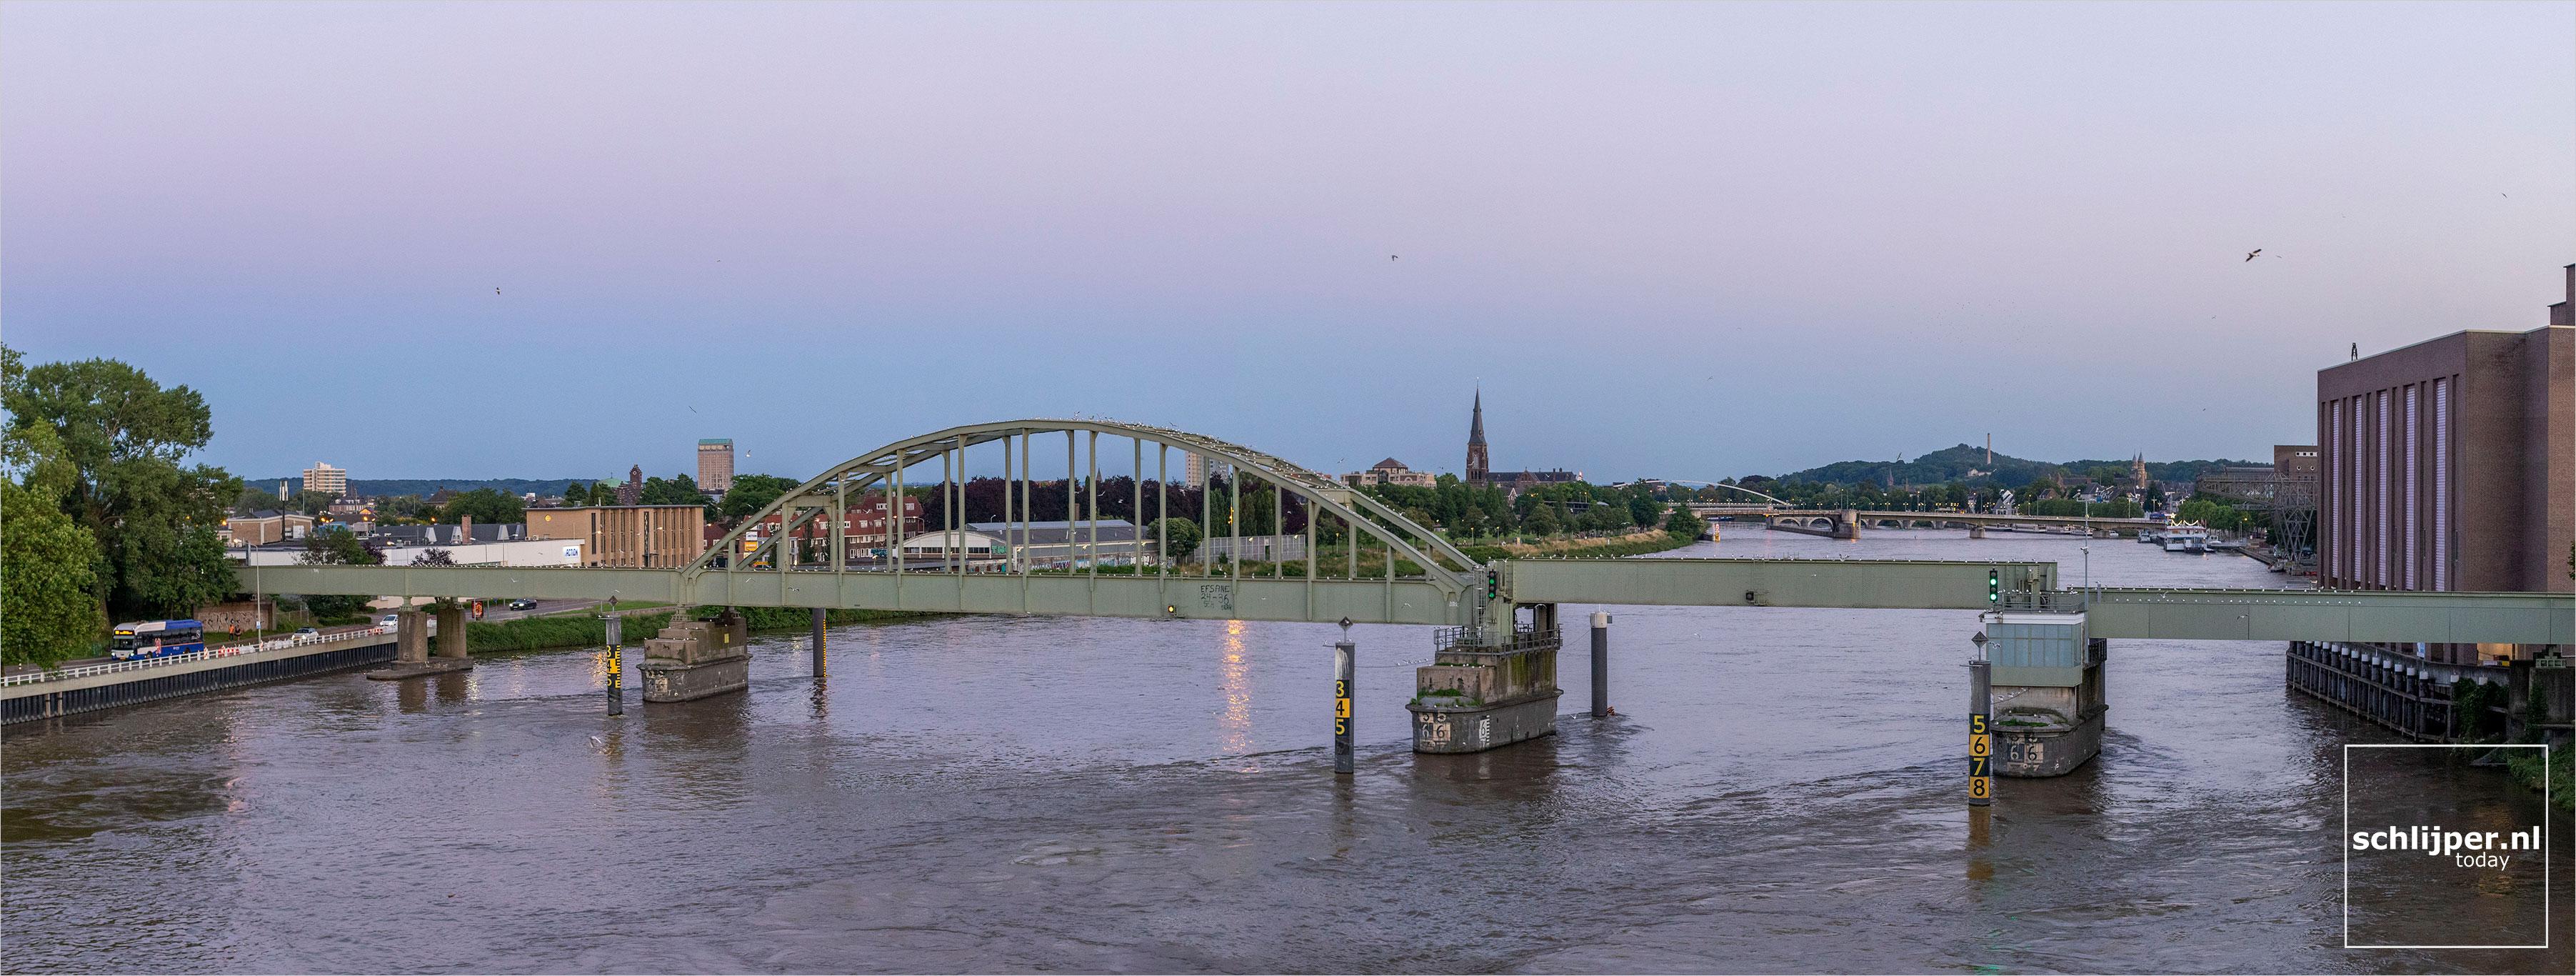 The Netherlands, Maastricht, 17 juli 2021